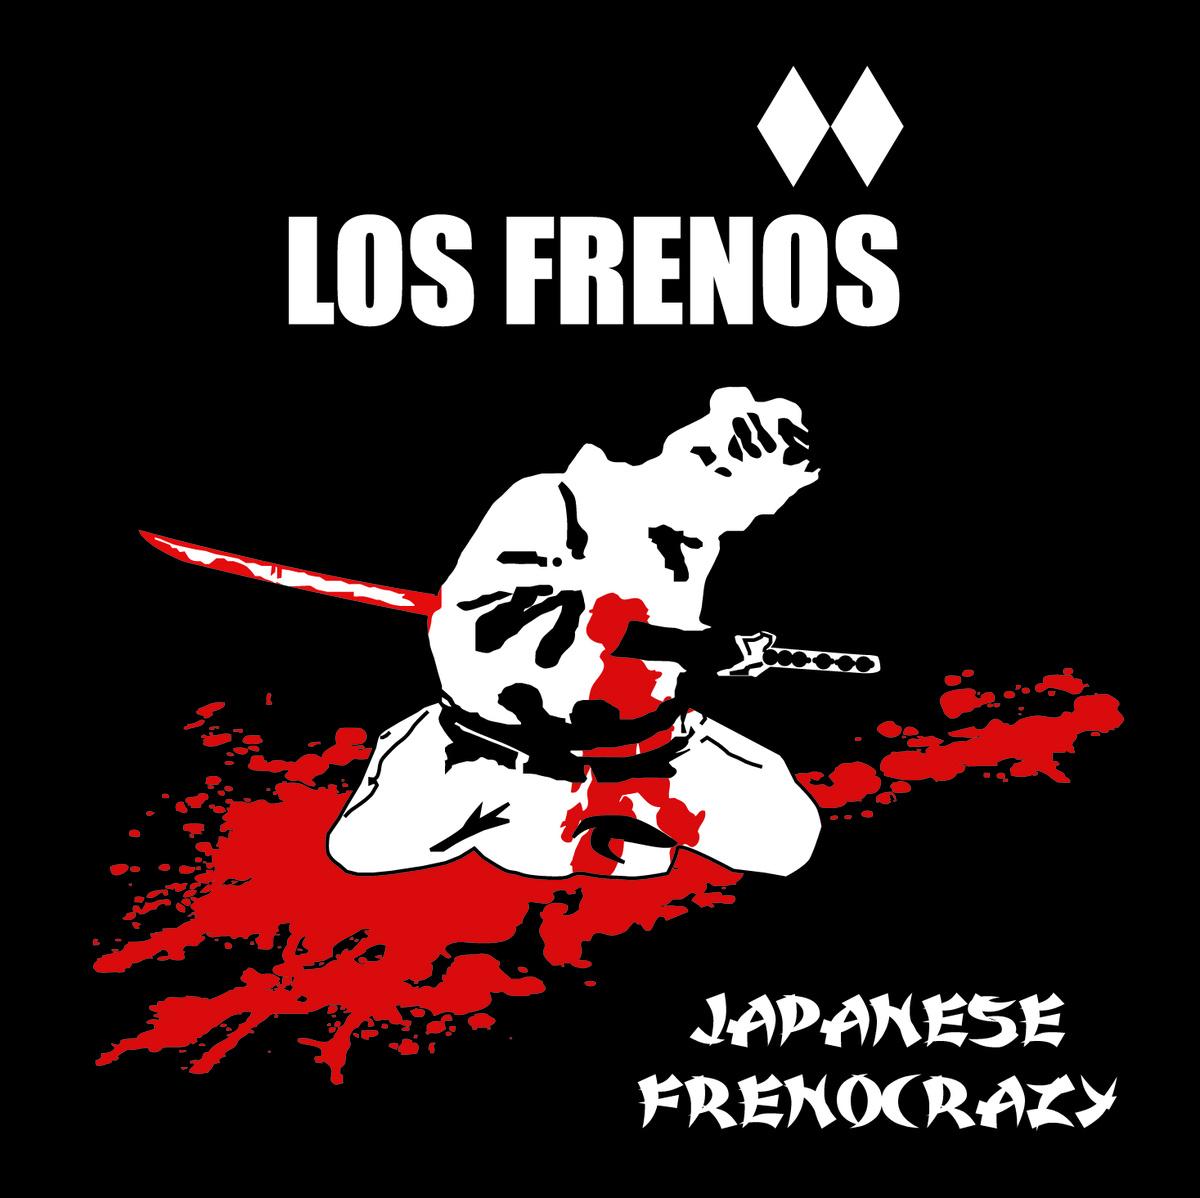 portada del album Japanese Frenocrazy